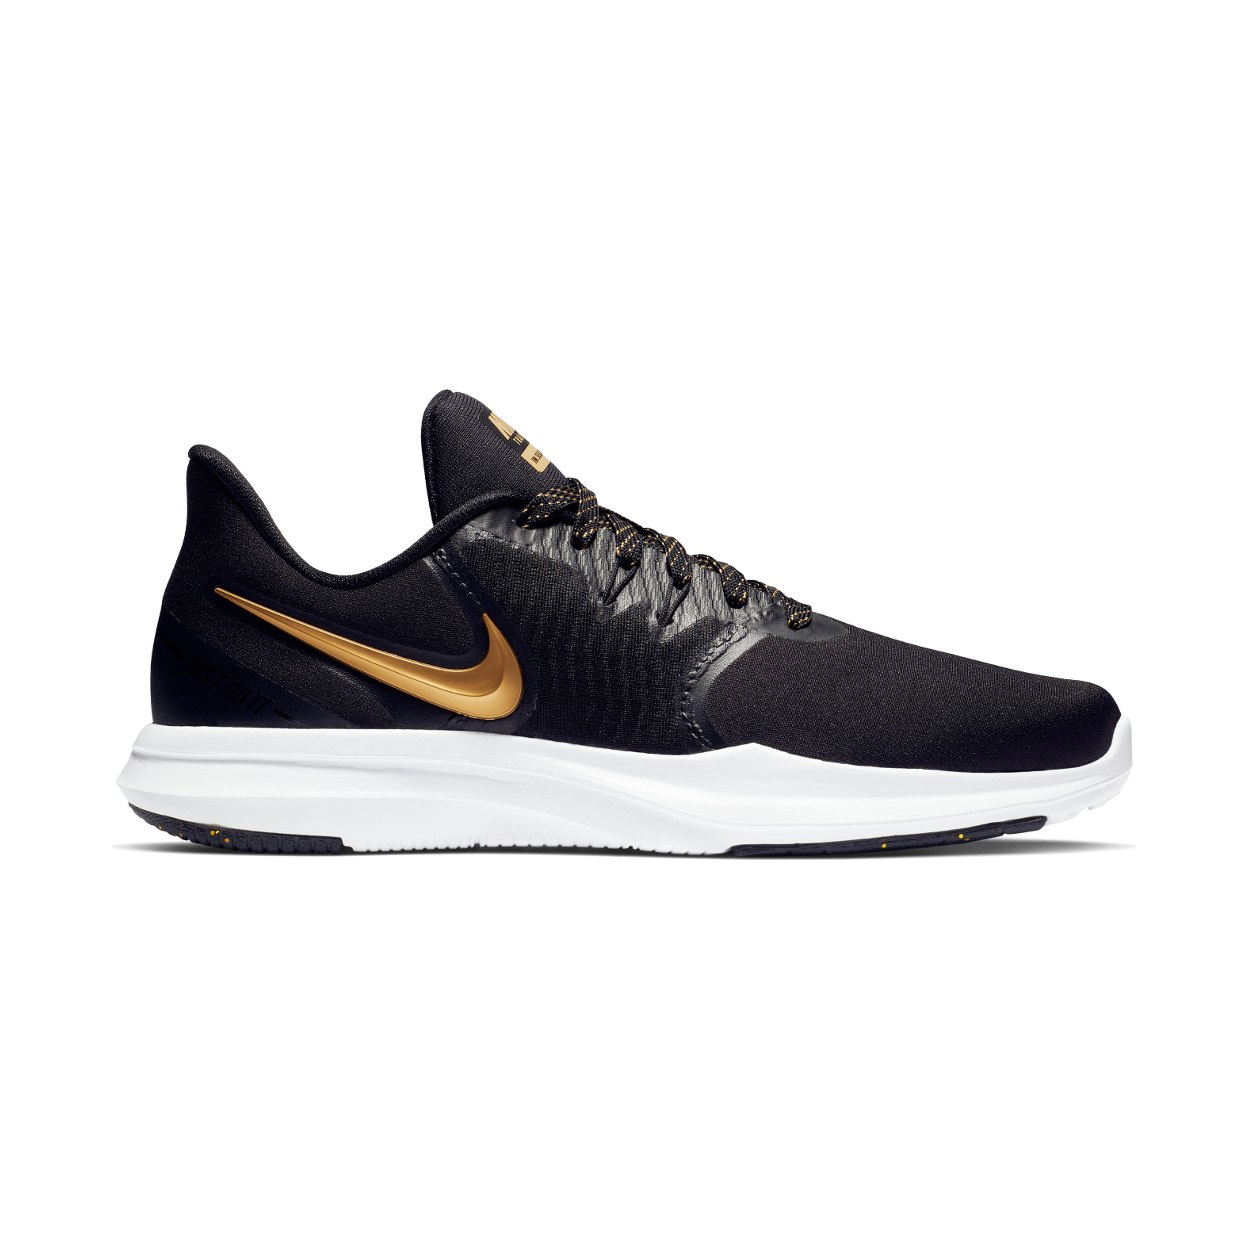 98e1537b7636 Nike Women s In-Season TR 8 Print Training Shoes - Black Gold ...